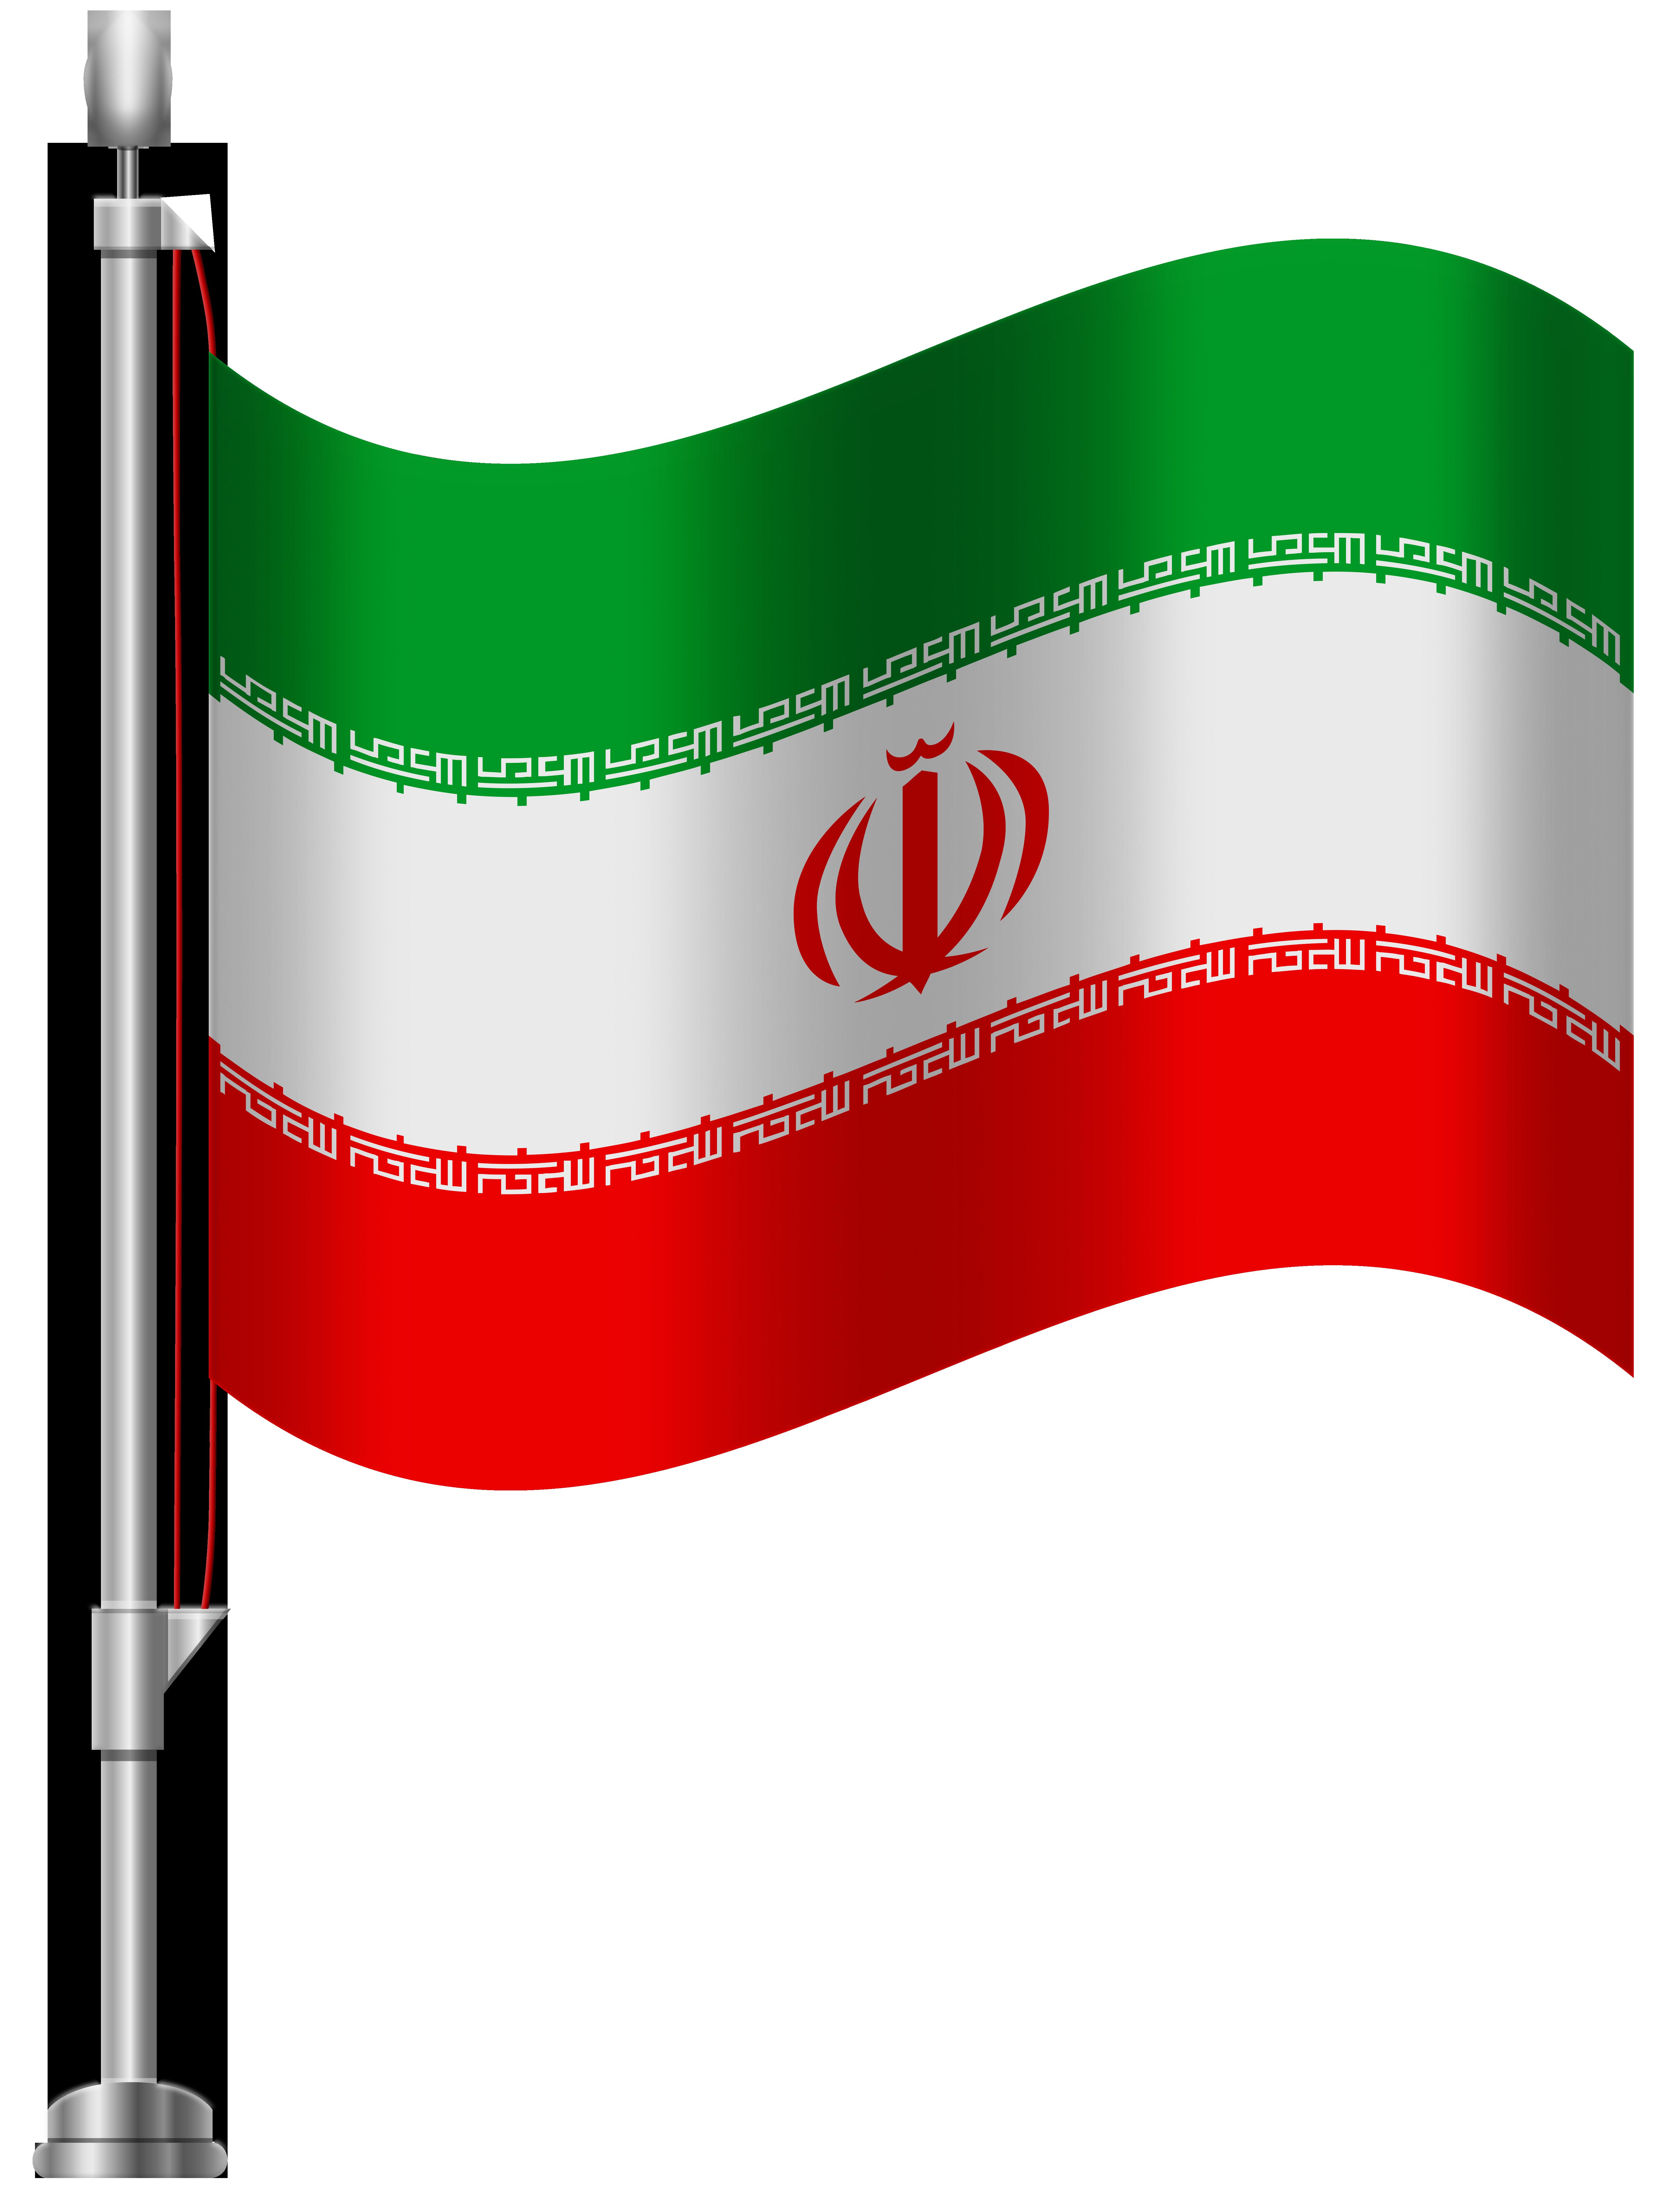 Iran clipart #6, Download drawings